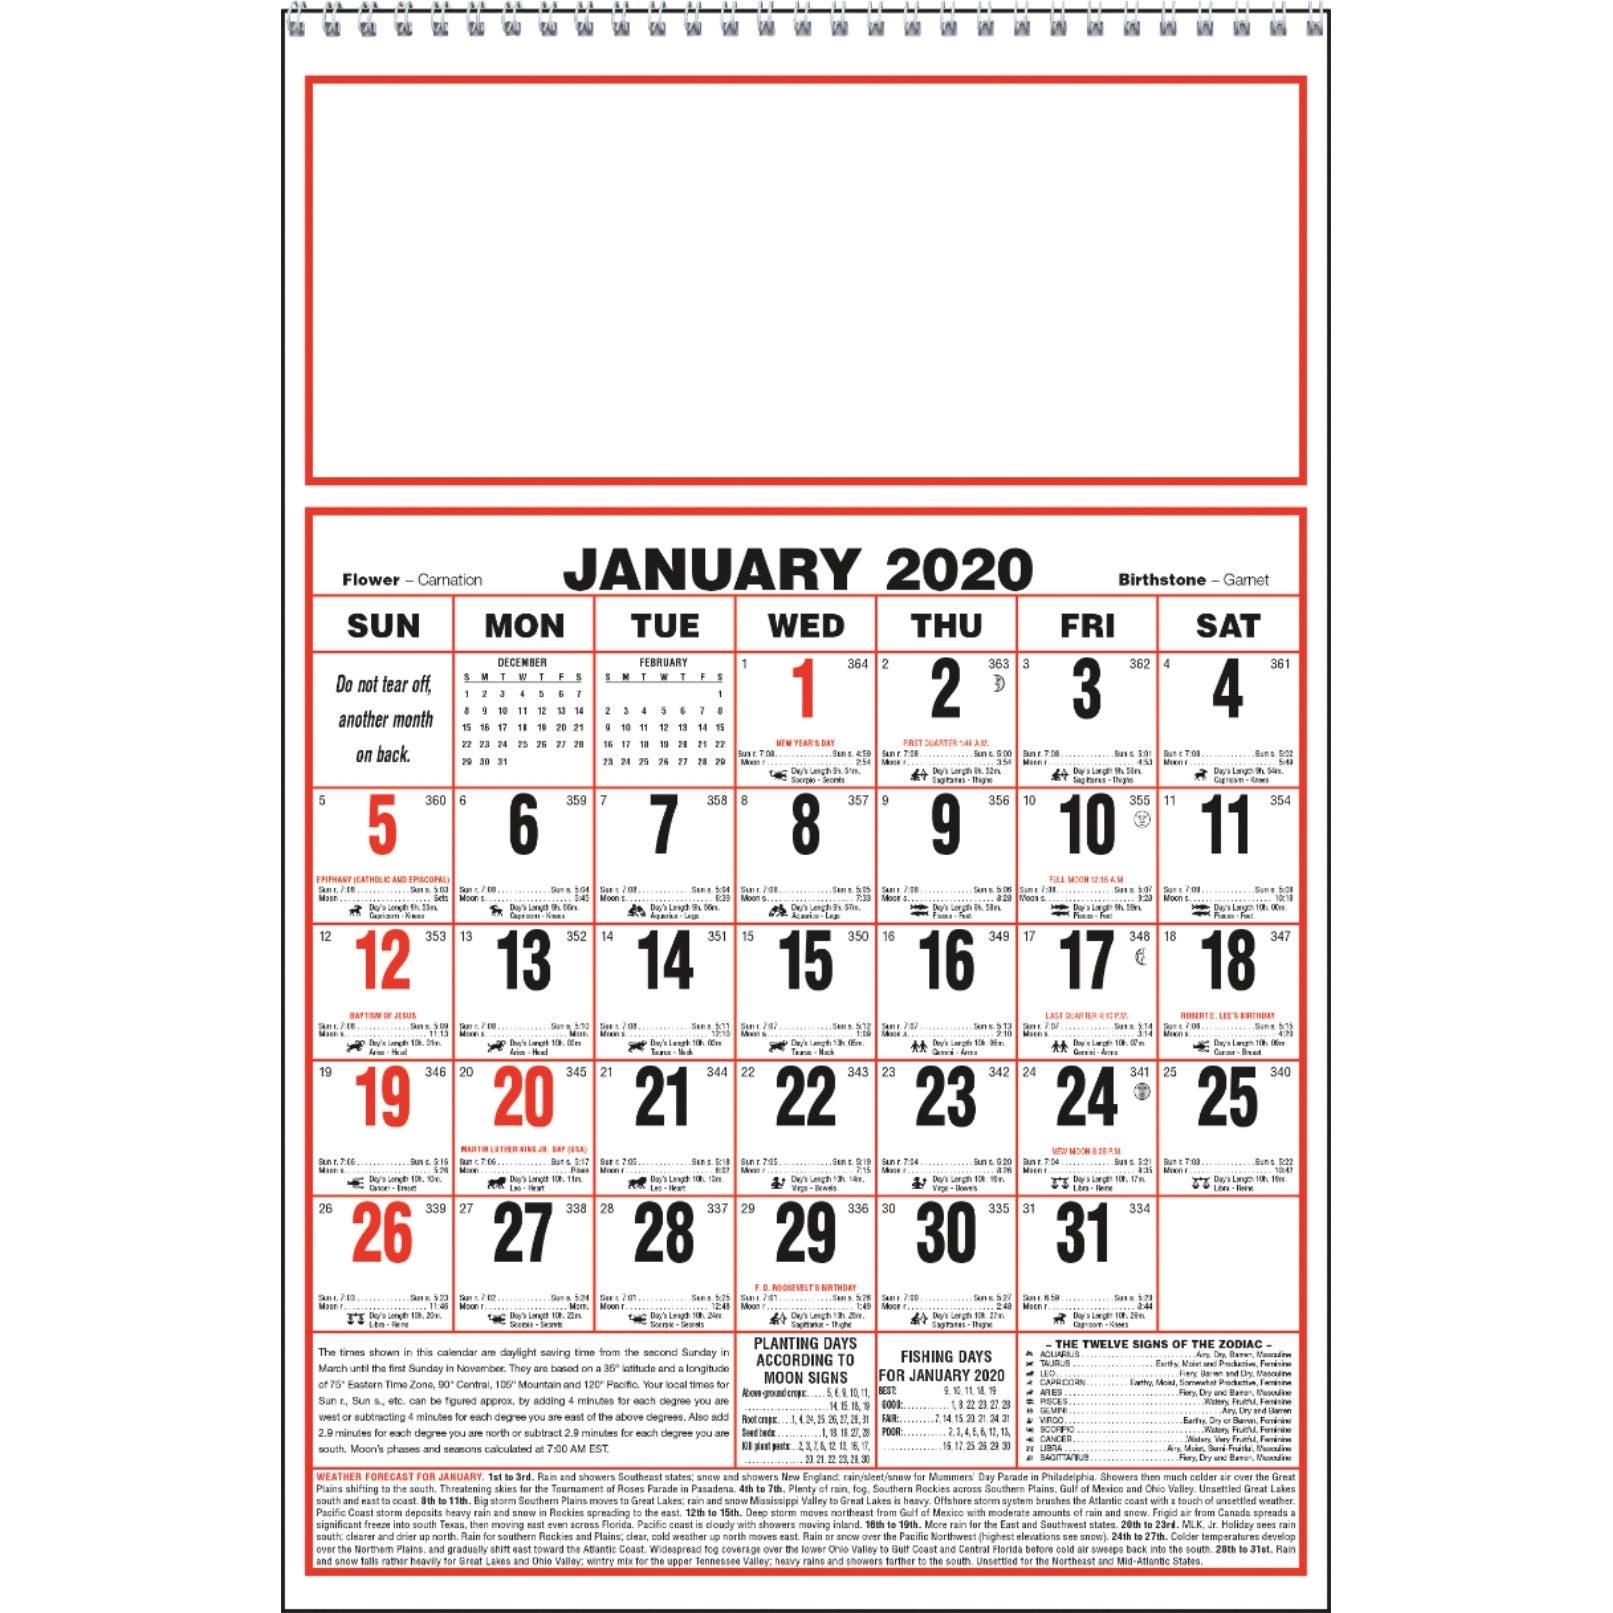 Disney World Crowd Calendar 2018 And 2019 Calendar 2020